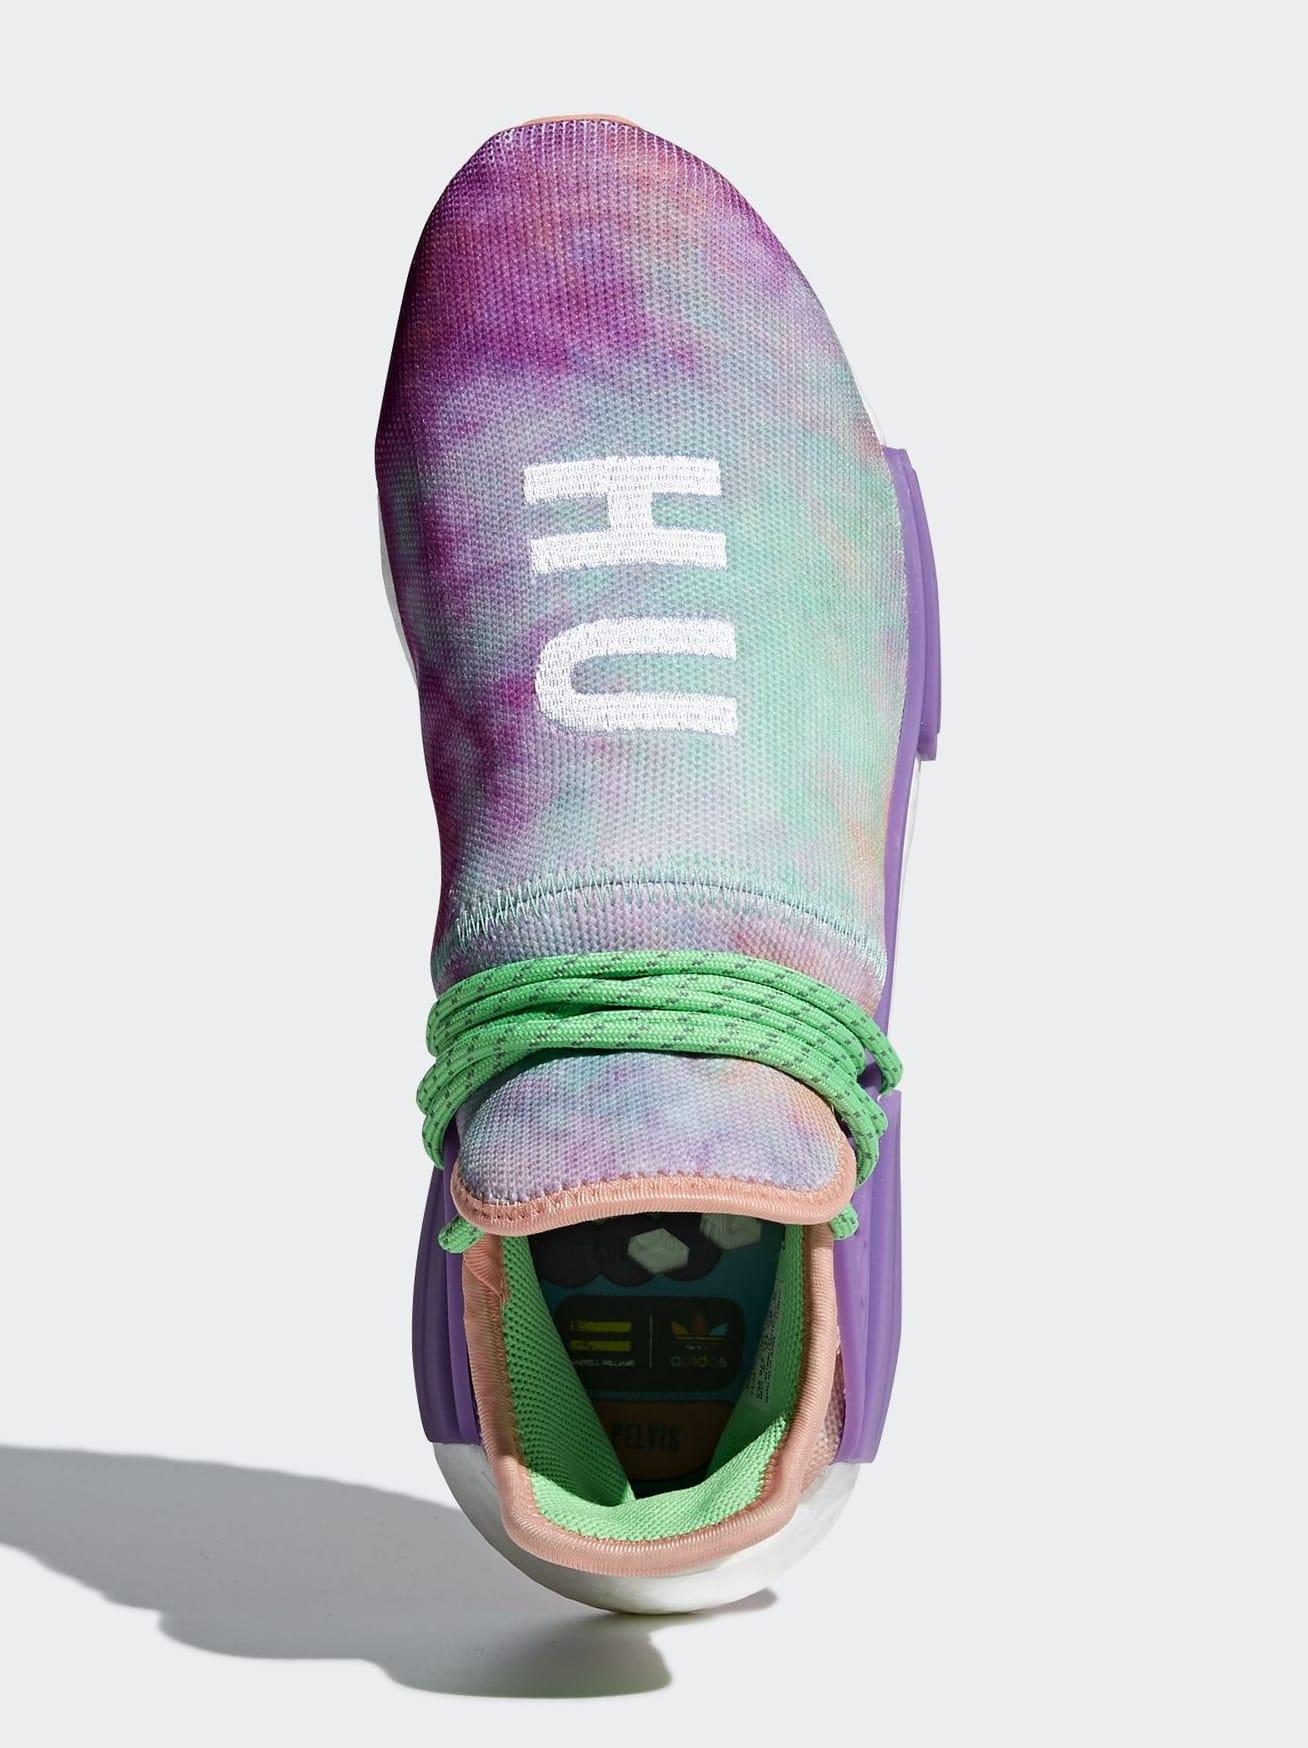 Pharrell x Adidas NMD HU Trail 'Holi' AC7034 (Top)